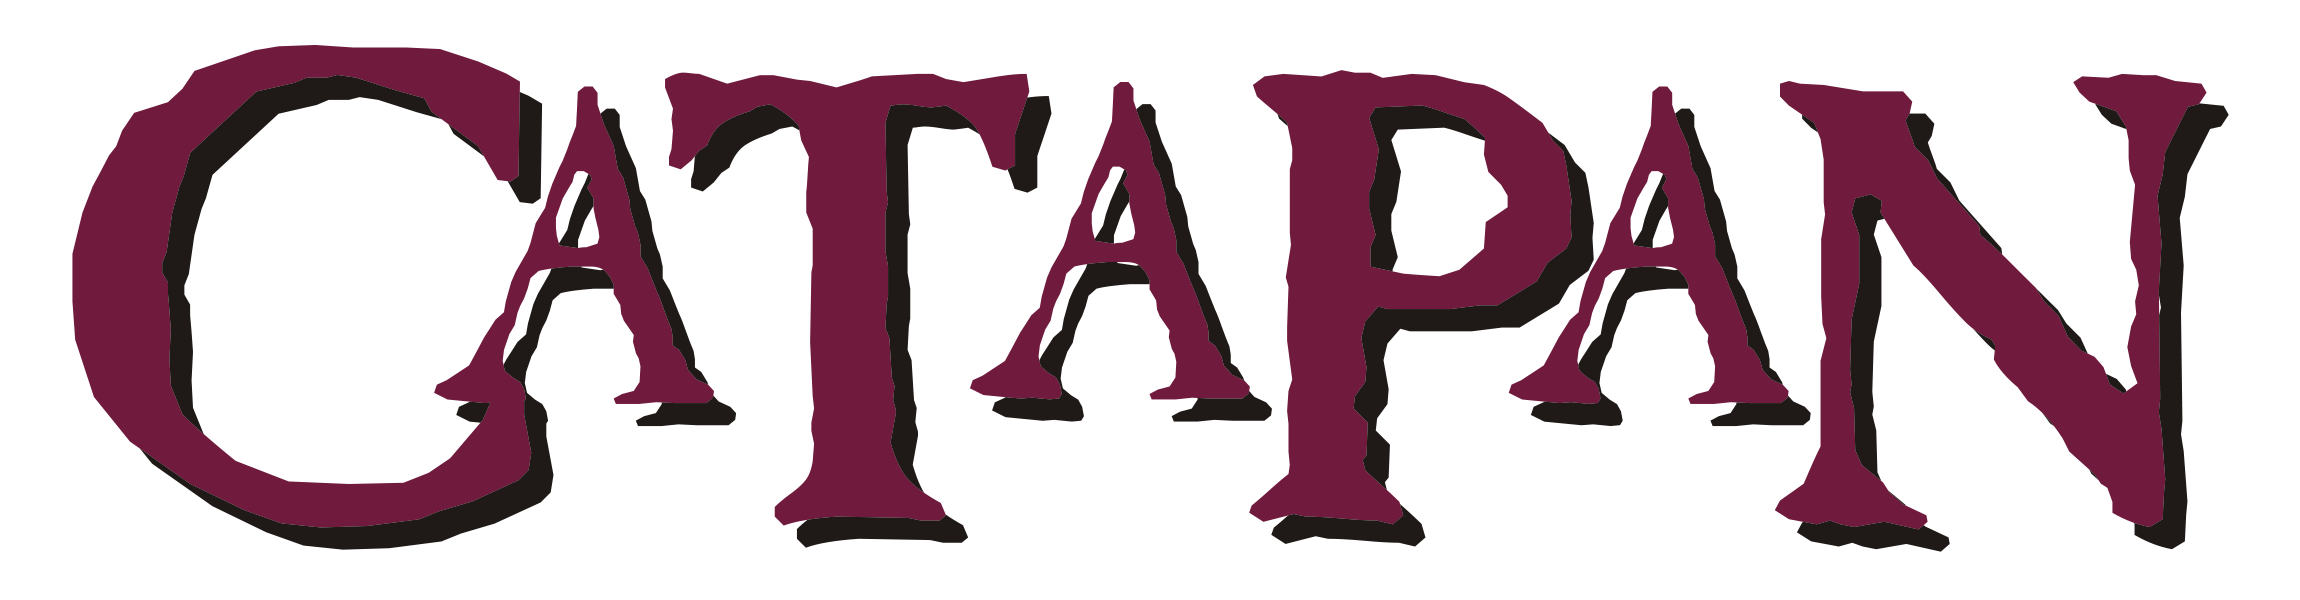 logo catapan